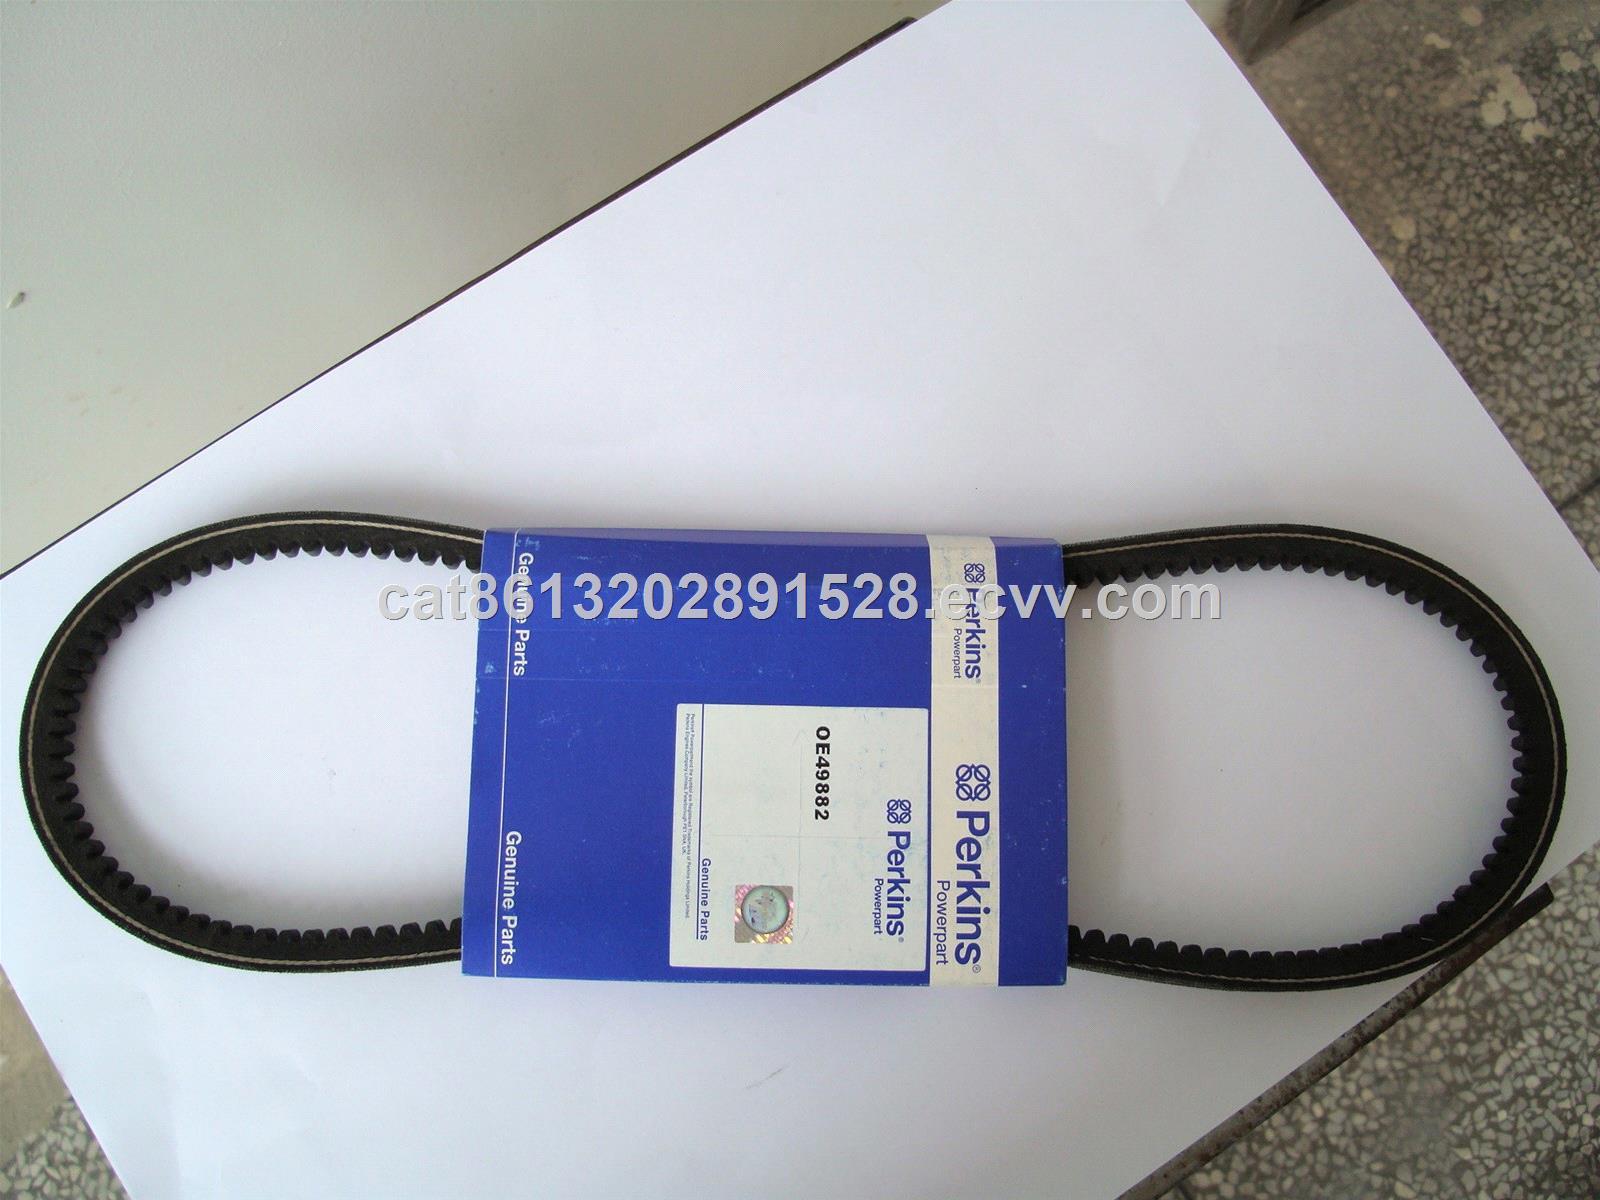 0577325230 MITSUBISHI Hose Rubber for Model FD30NT Engine S4SMitsubishi PartsAuto Parts